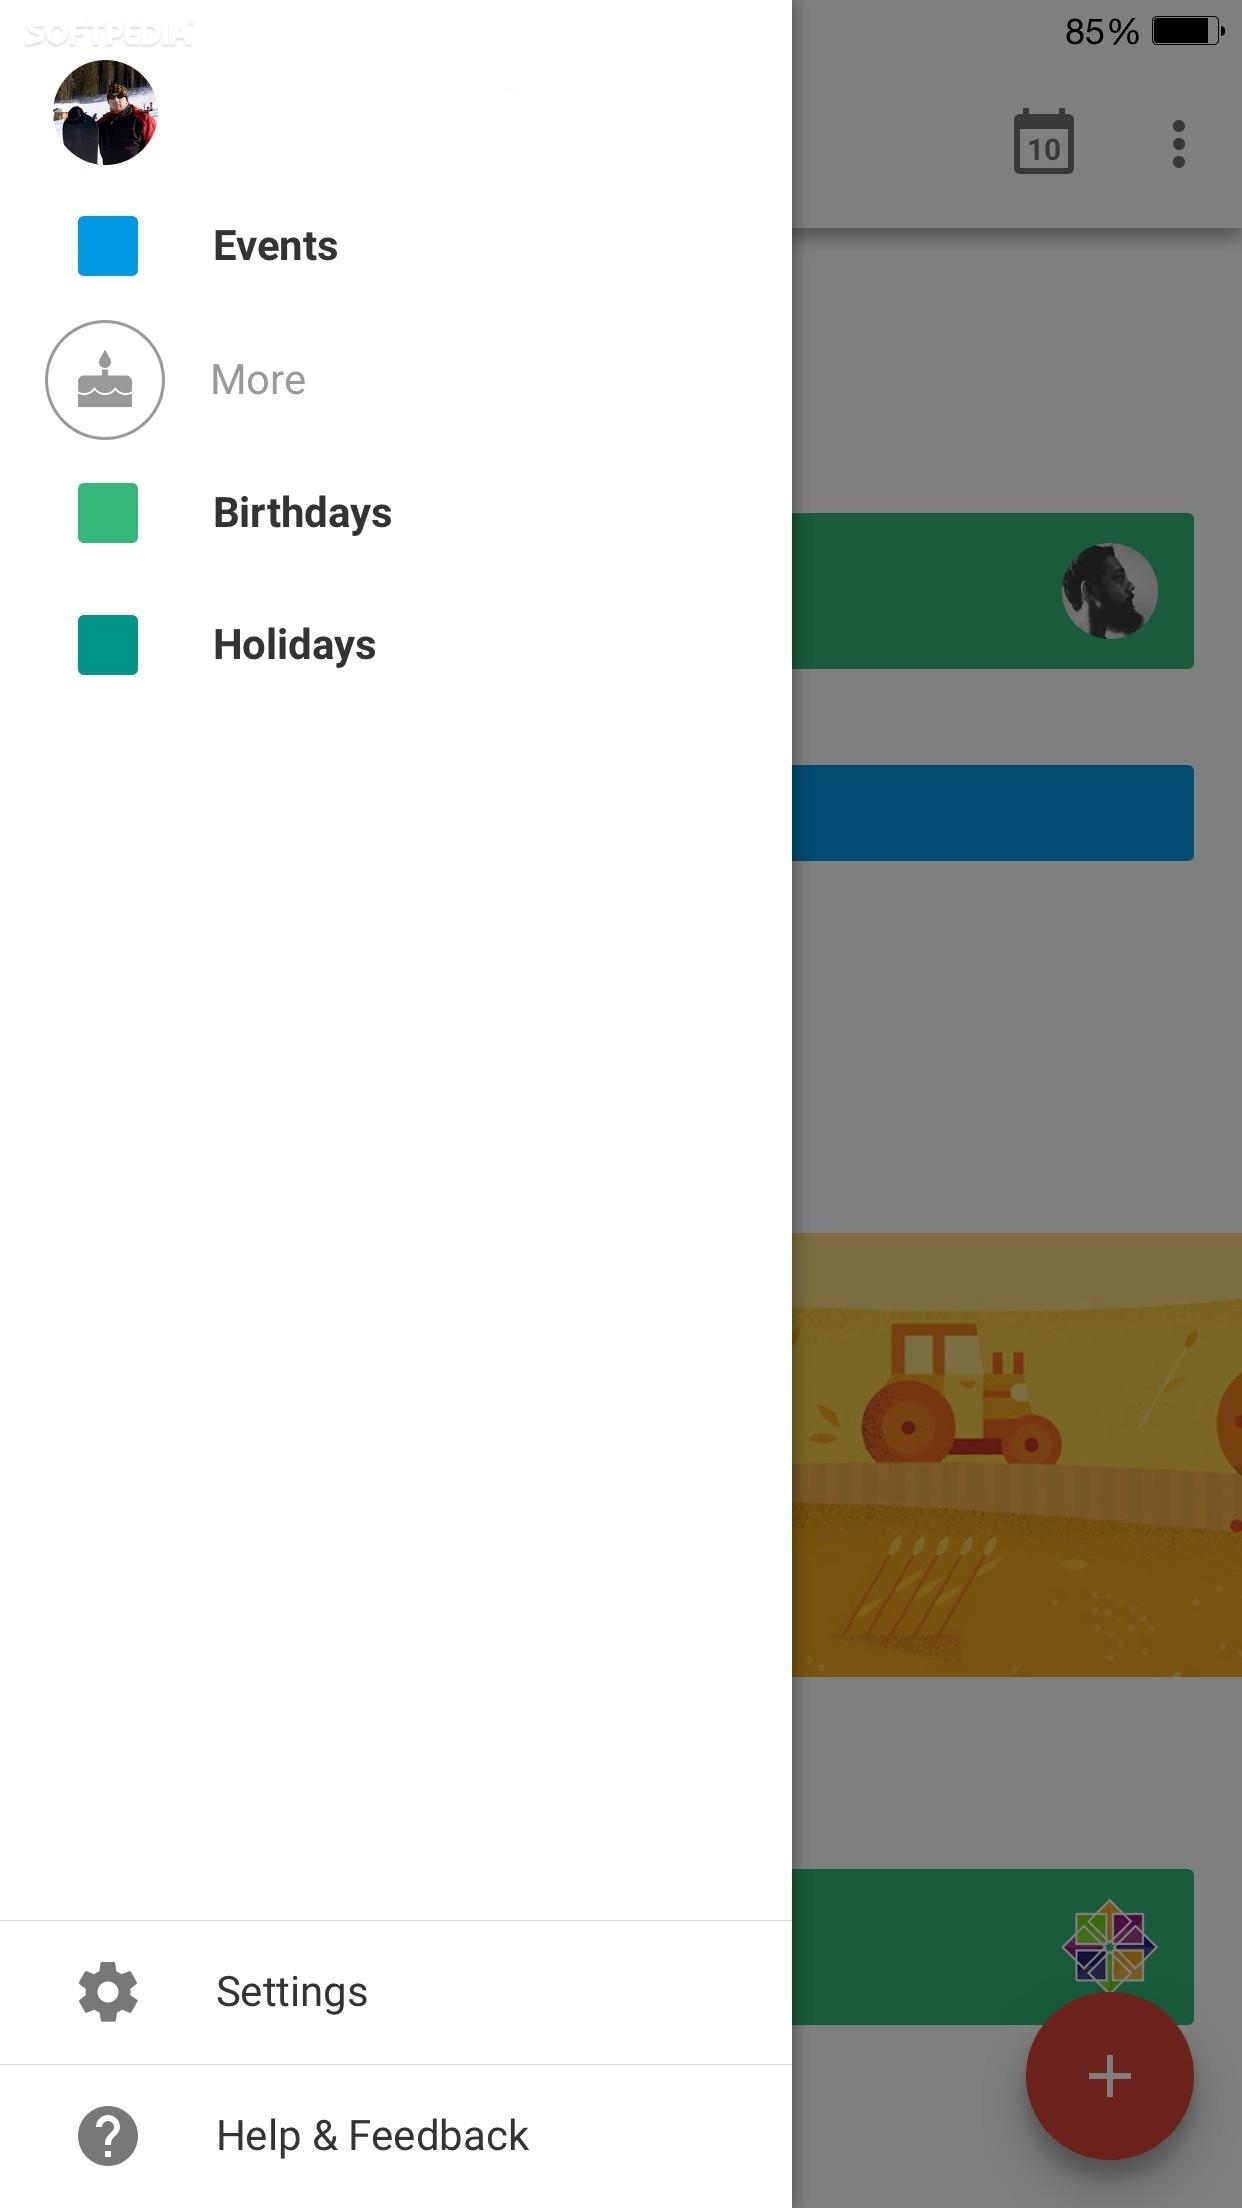 Google Releases Official Google Calendar App for iPhone